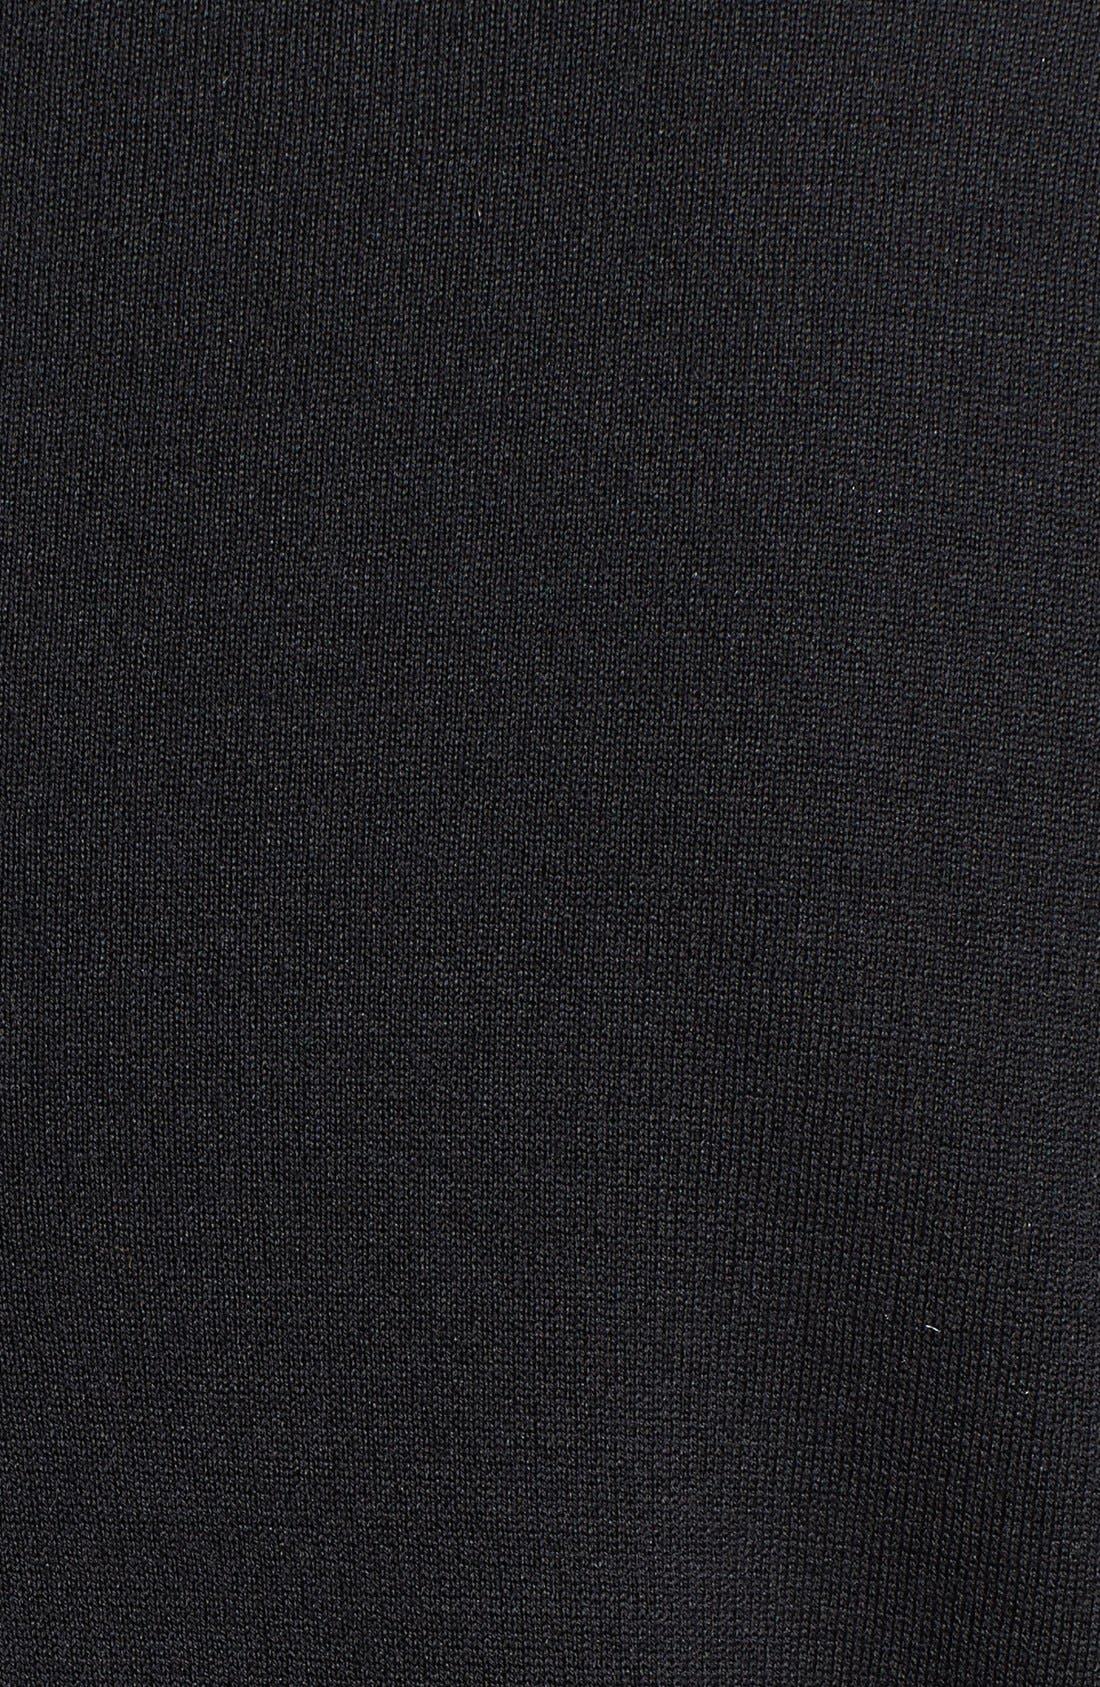 'Alexa' Stretch Milano Knit Ankle Pants,                             Alternate thumbnail 7, color,                             CAVIAR